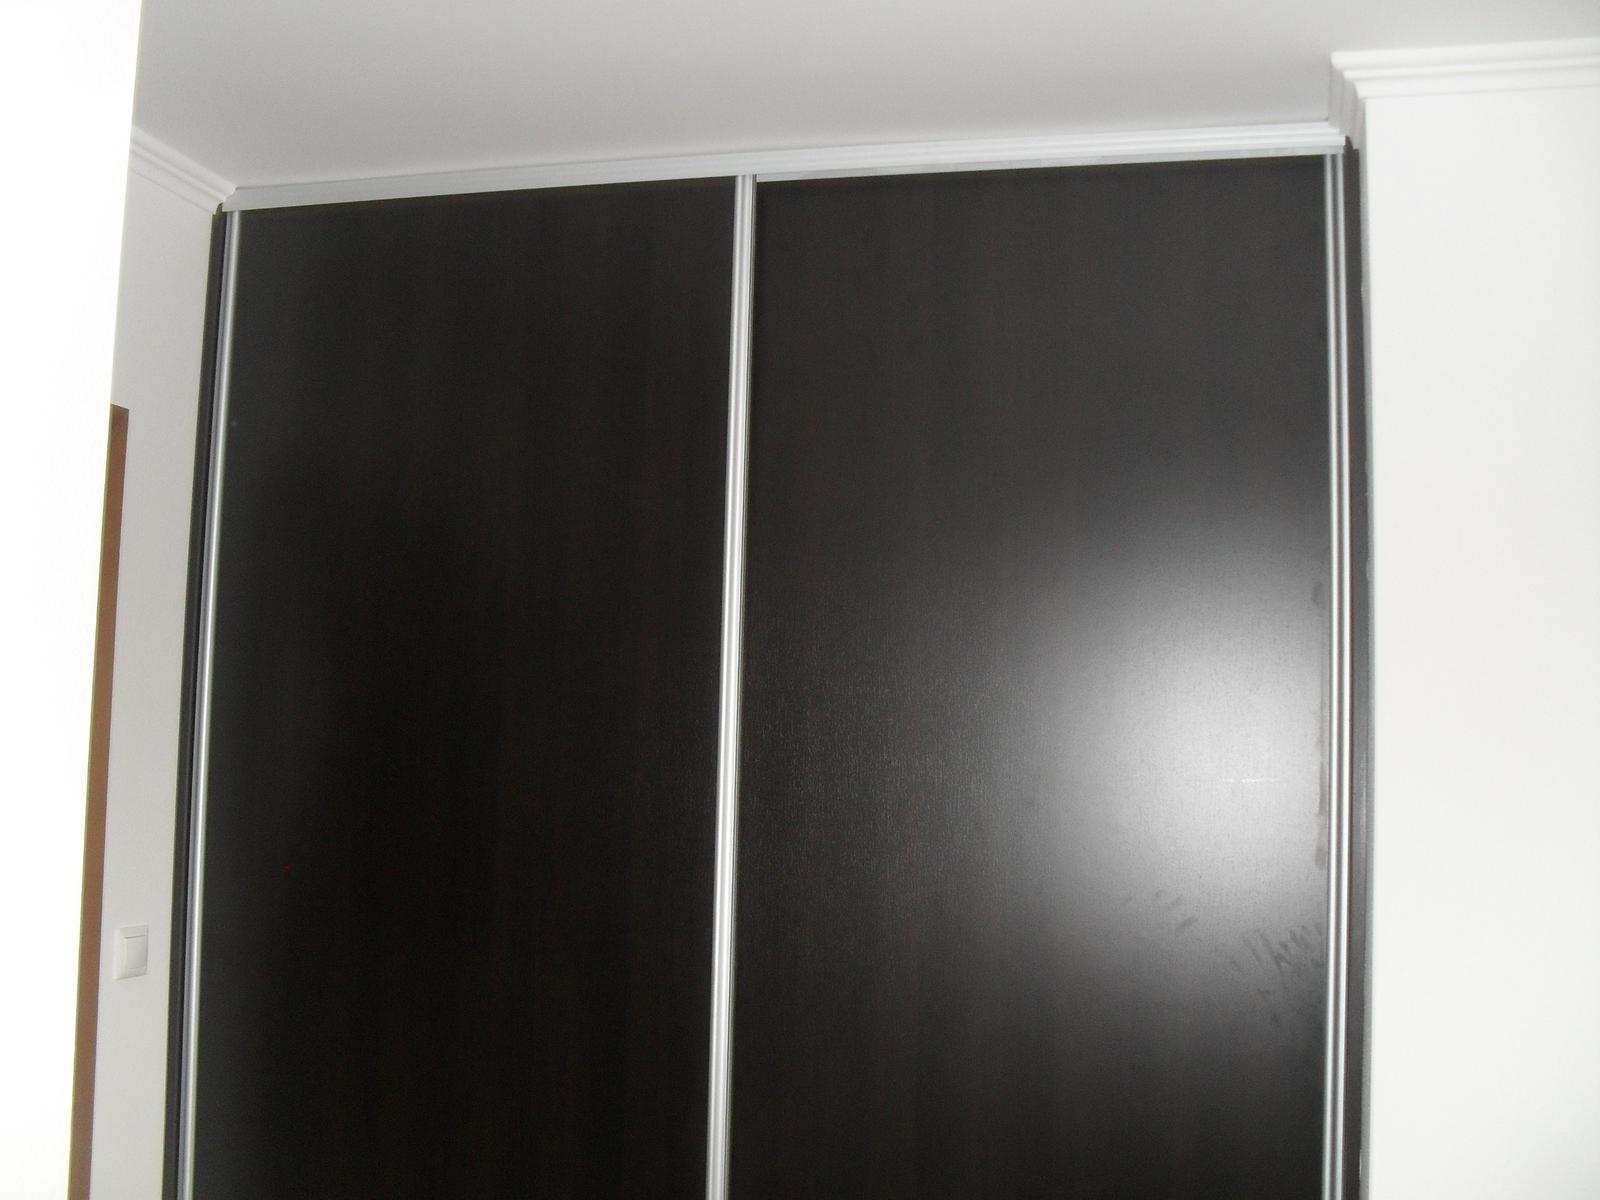 Vstavané skrine Martin Benko Bošany - Obrázok č. 4